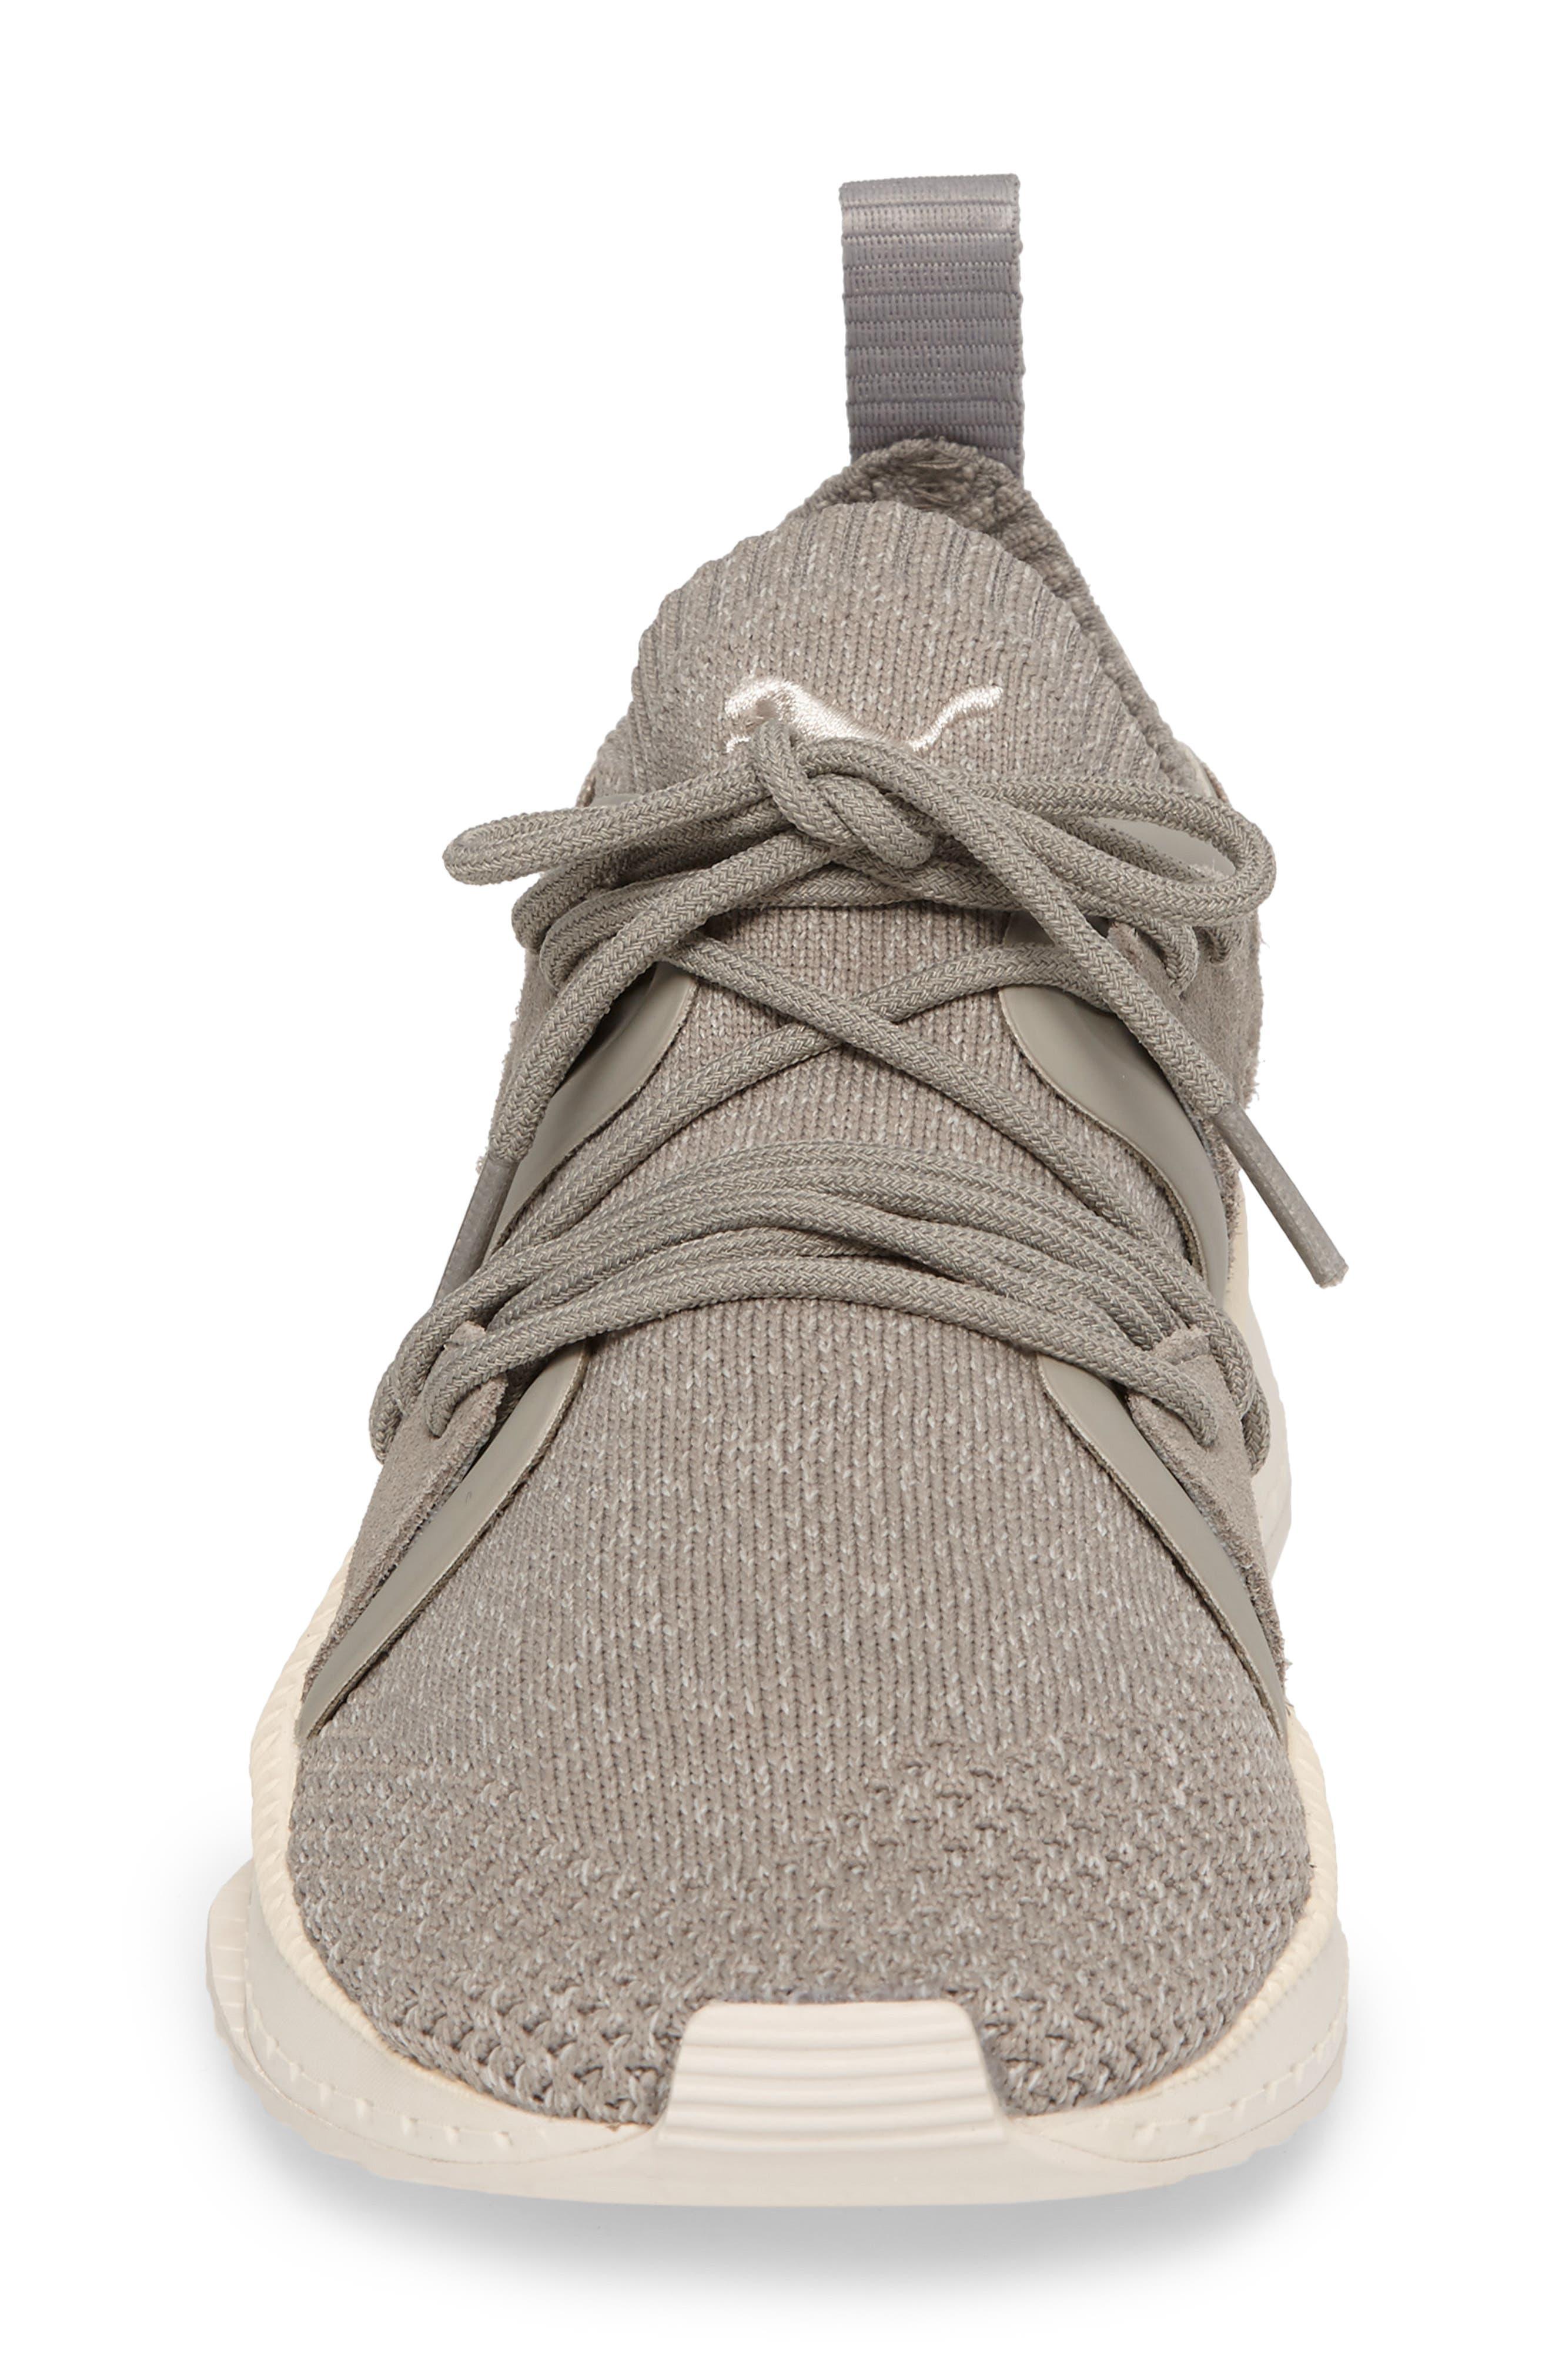 Tsug Blaze Evoknit Sneaker,                             Alternate thumbnail 4, color,                             253